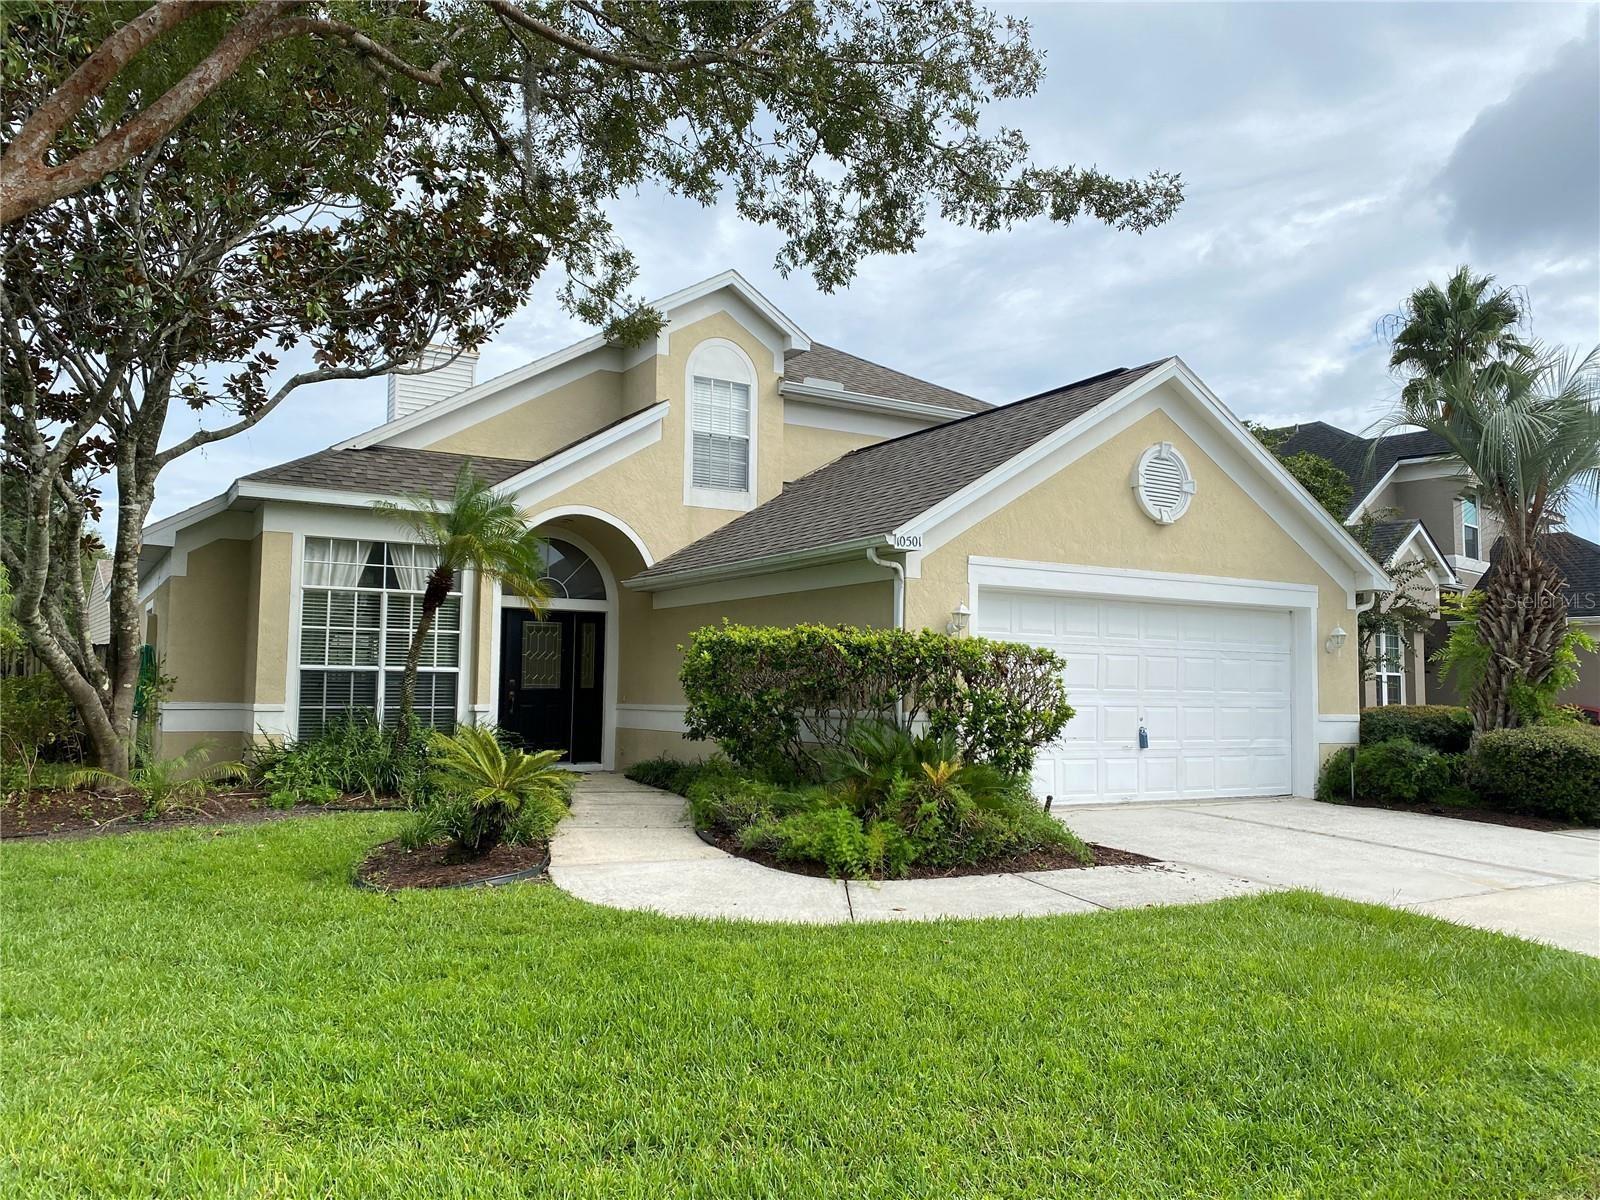 10501 CHERRY OAK CIRCLE, Orlando, FL 32817 - #: S5056033